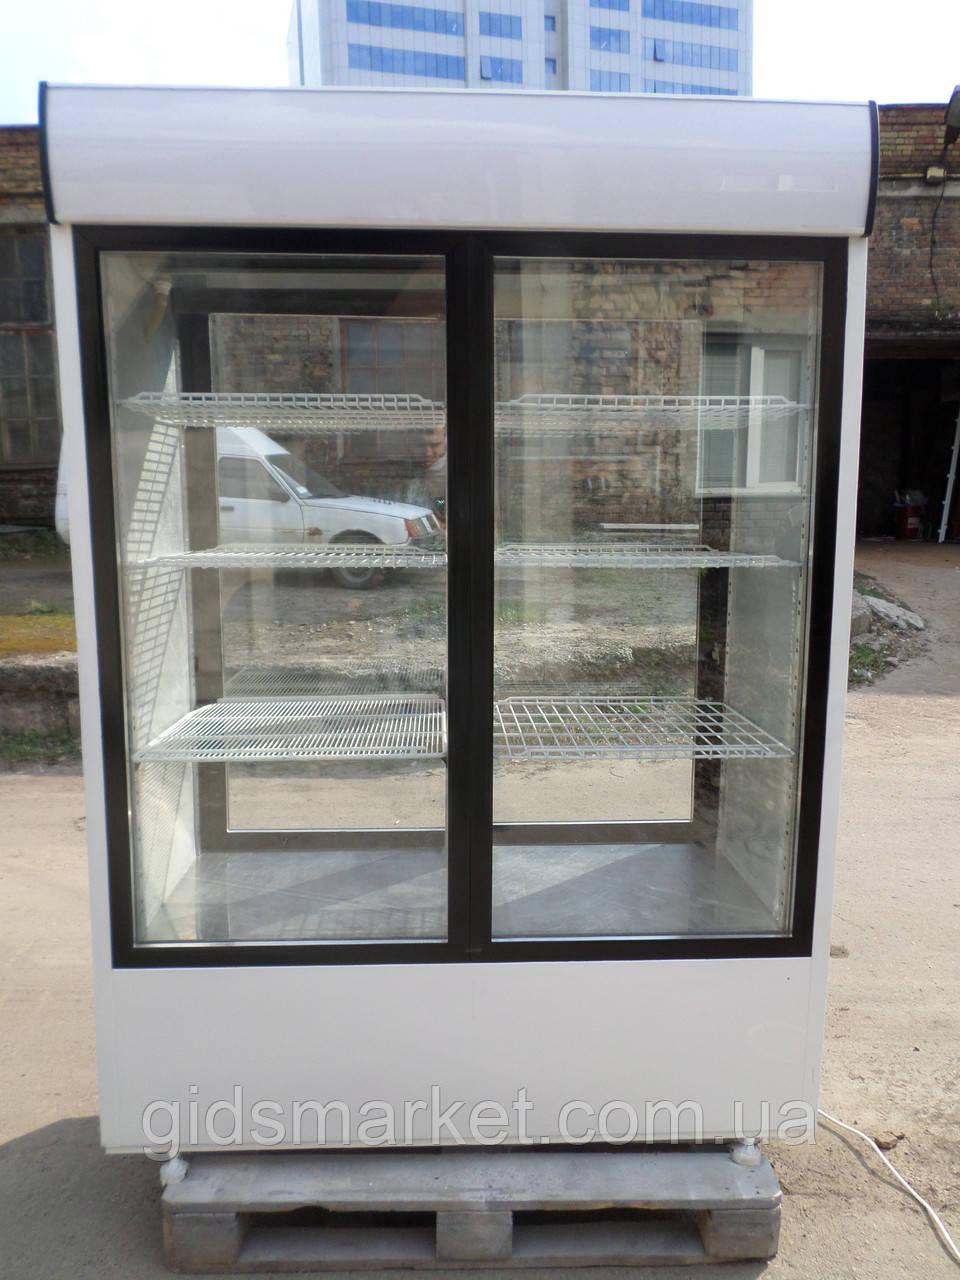 шкаф витрина холодильная Cold Sw 1400 бу холодильный шкаф купе бу